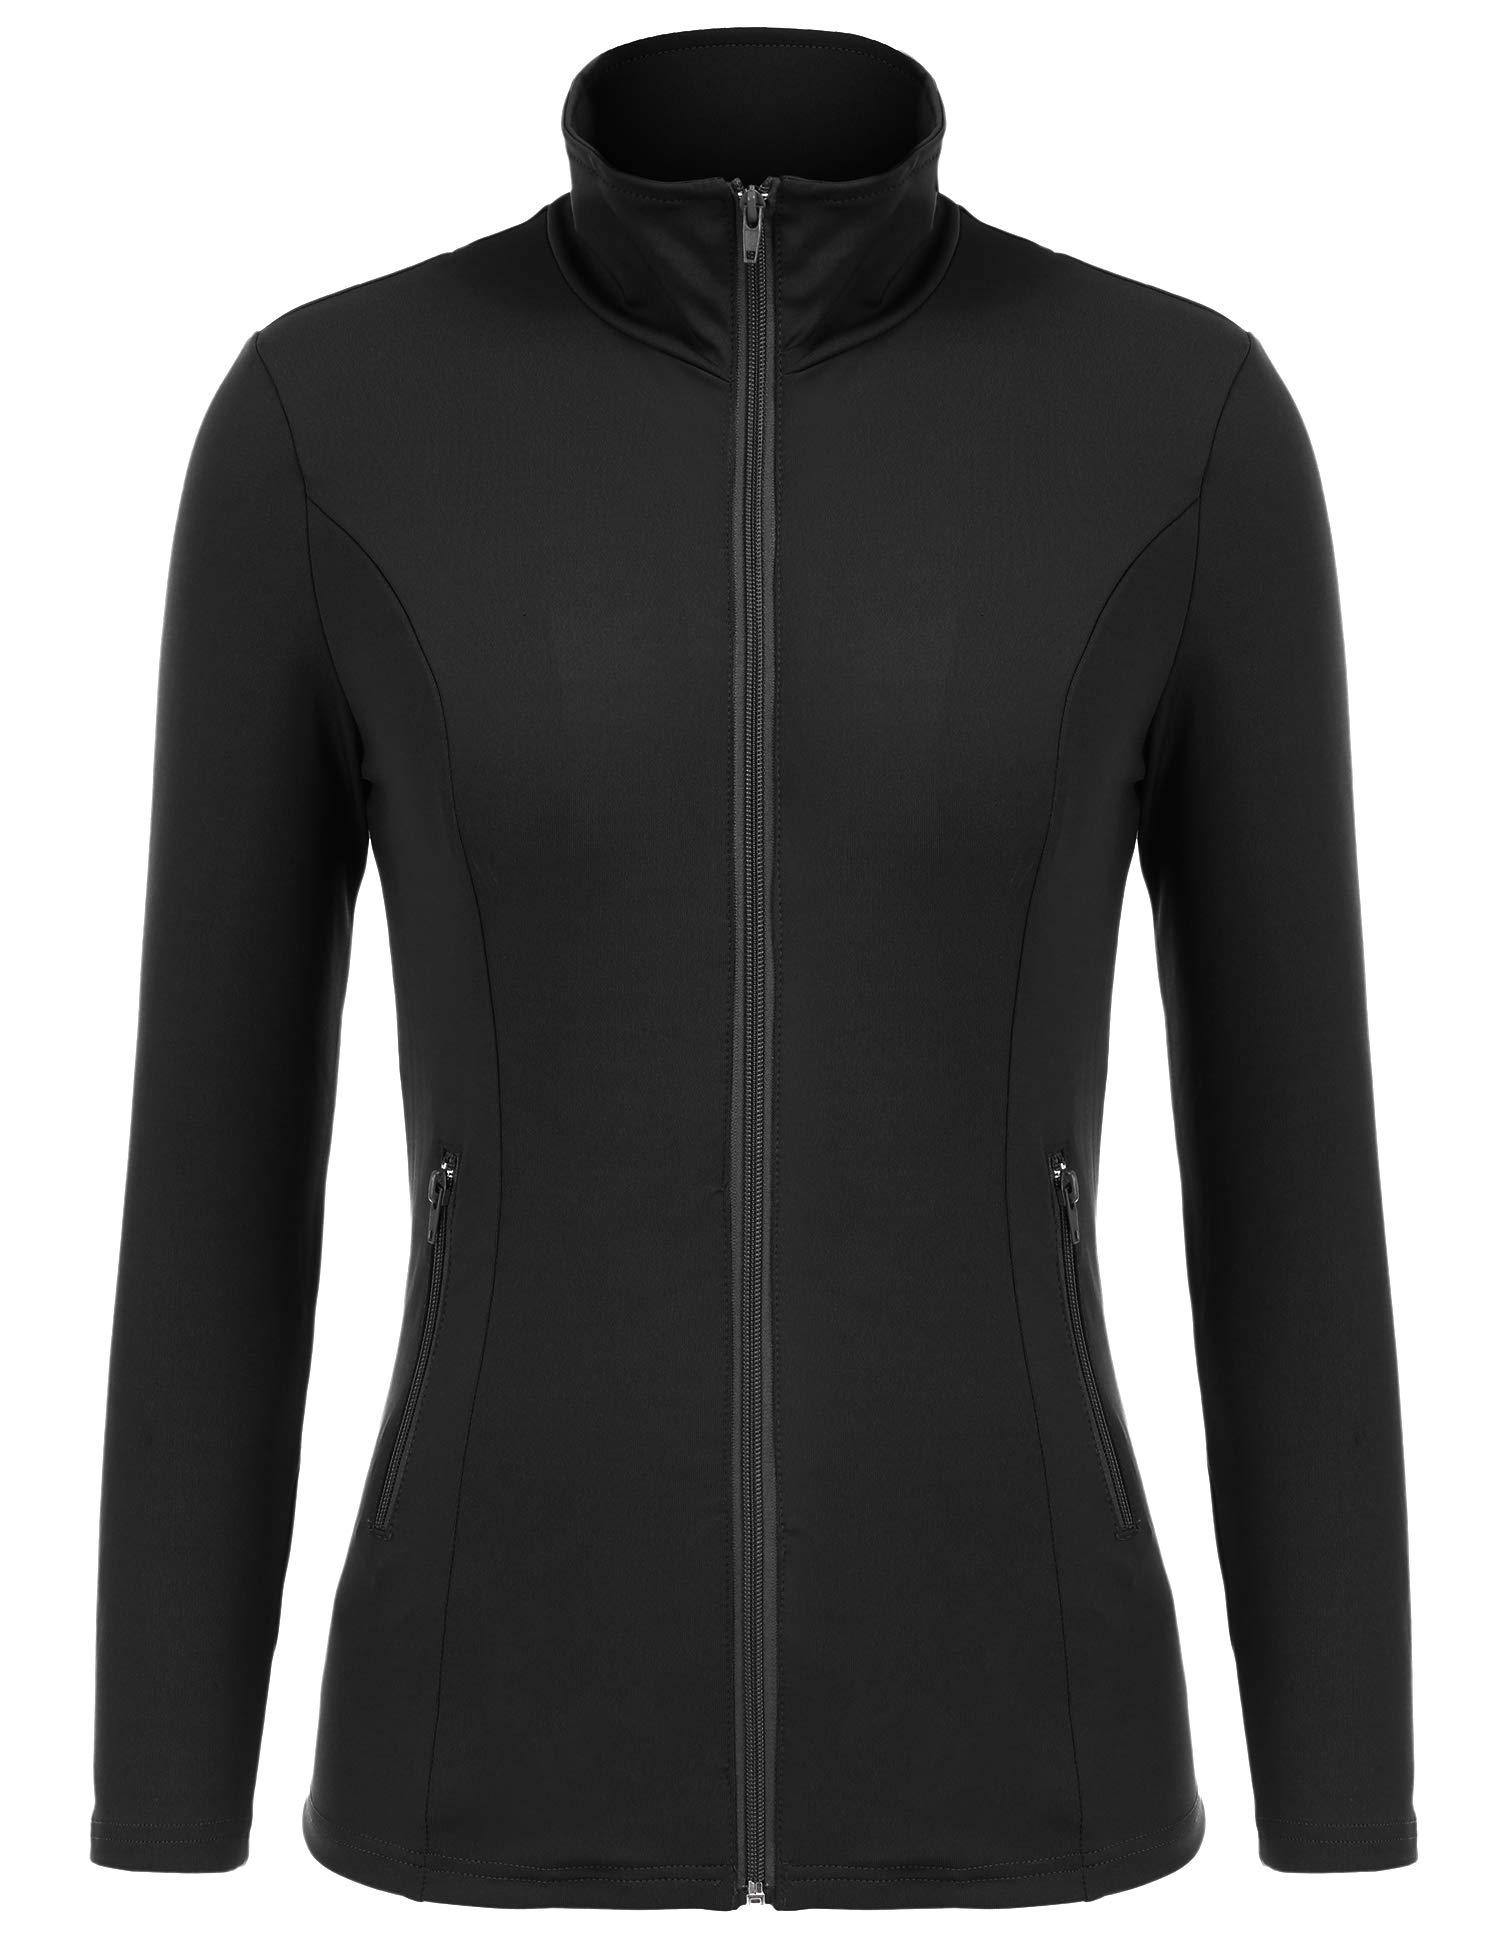 Bosbary Women's Sports Jacket Lightweight Full Zip Workout Jacket with Zipper Pockets(Black,X-Large)